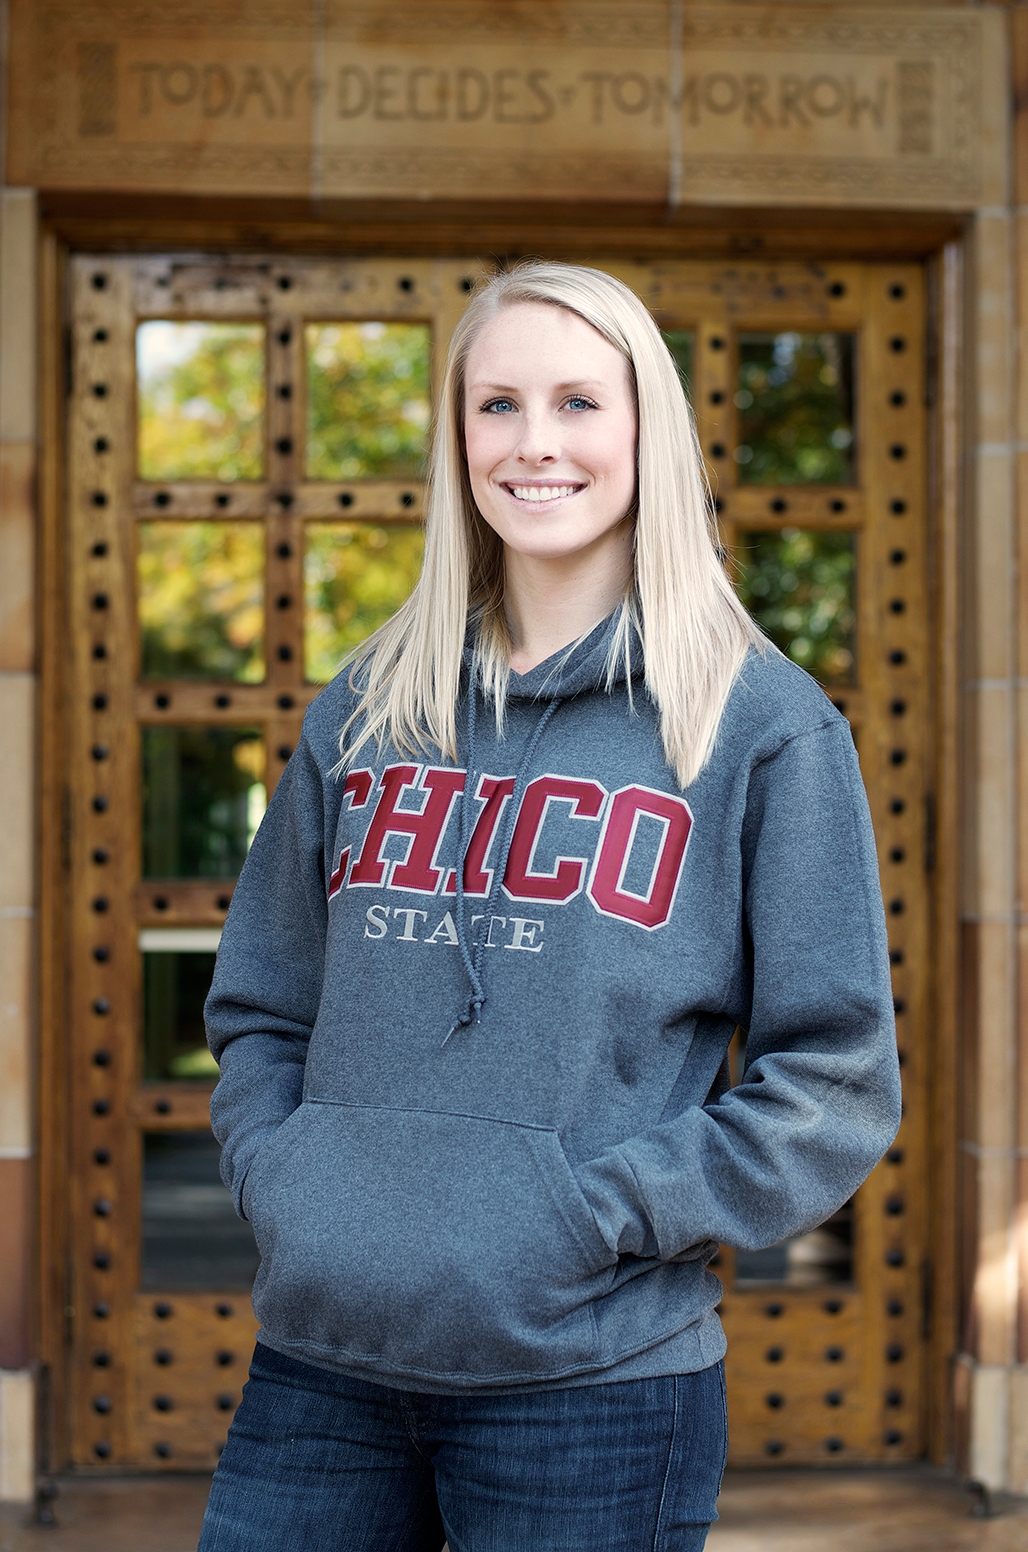 Chico State Sweatshirt - Heather Selzer.jpg